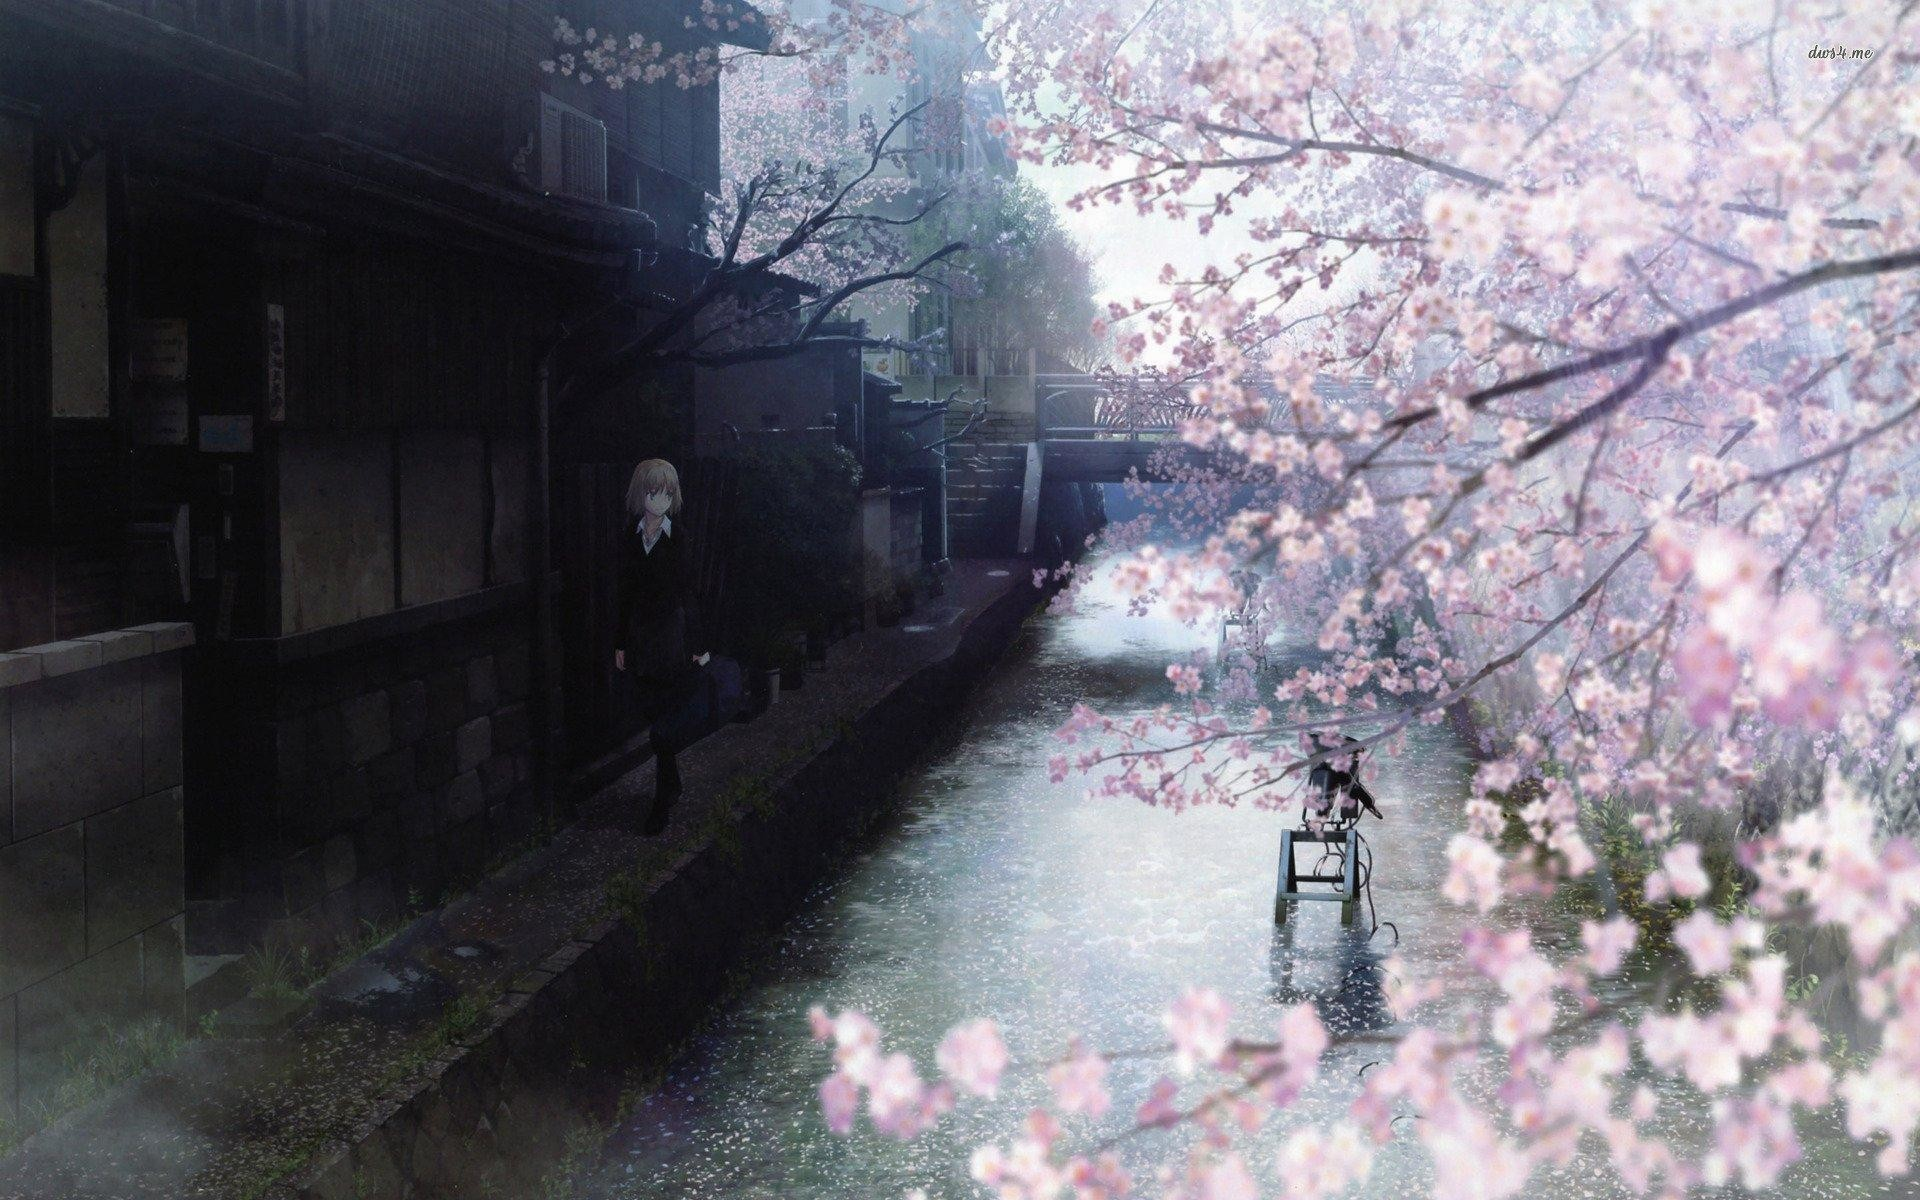 wallpaper.wiki-HQ-Anime-Cherry-Blossom-PIC-WPC004906